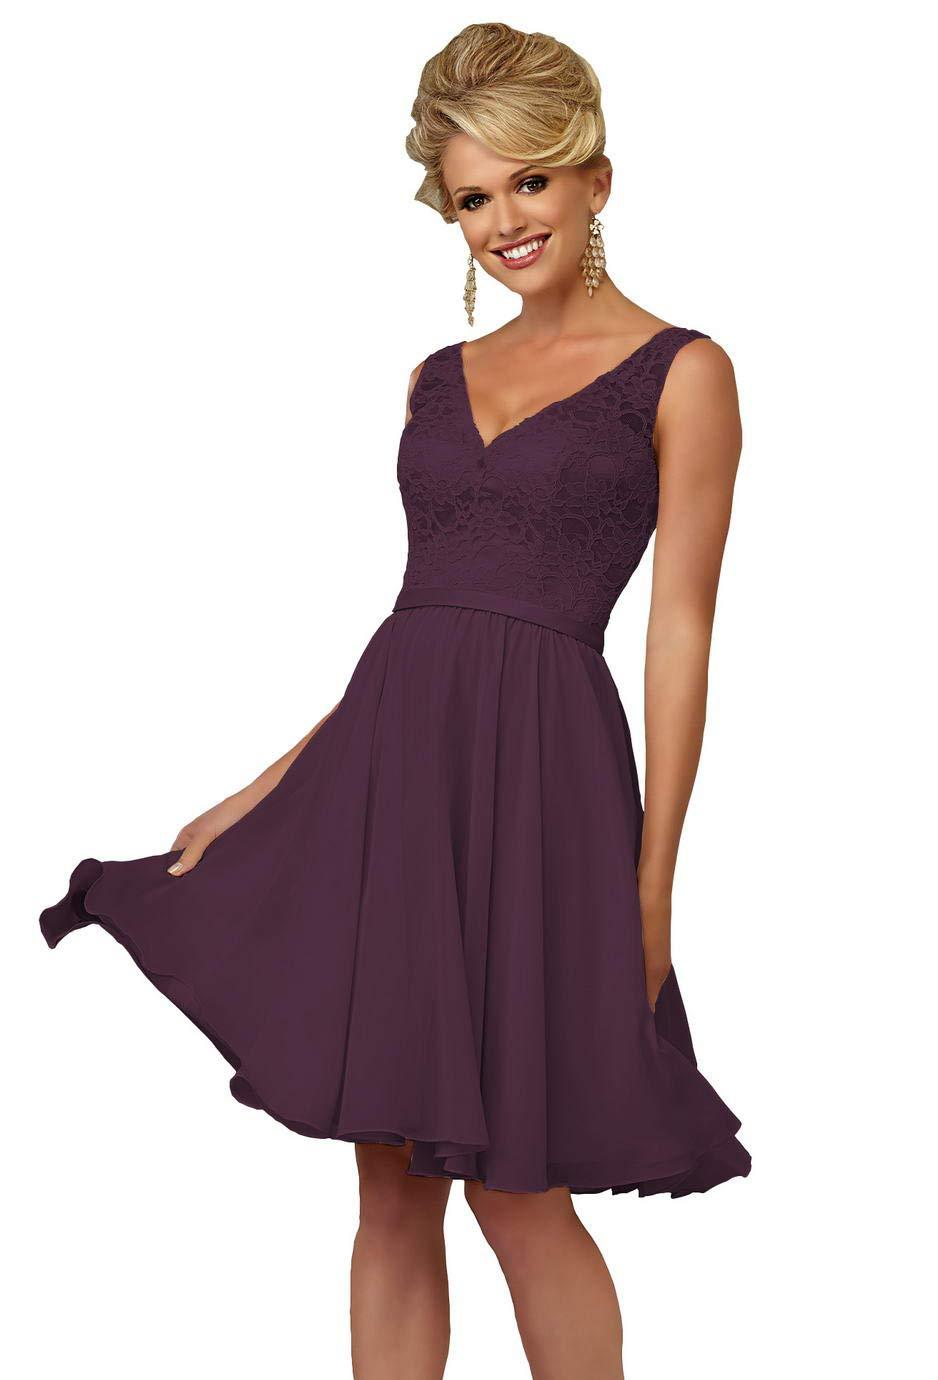 V-Neck A-line Knee Length Lace Plus Size Bridesmaid Dress Short Formal  Party Gown Size 18 Plum